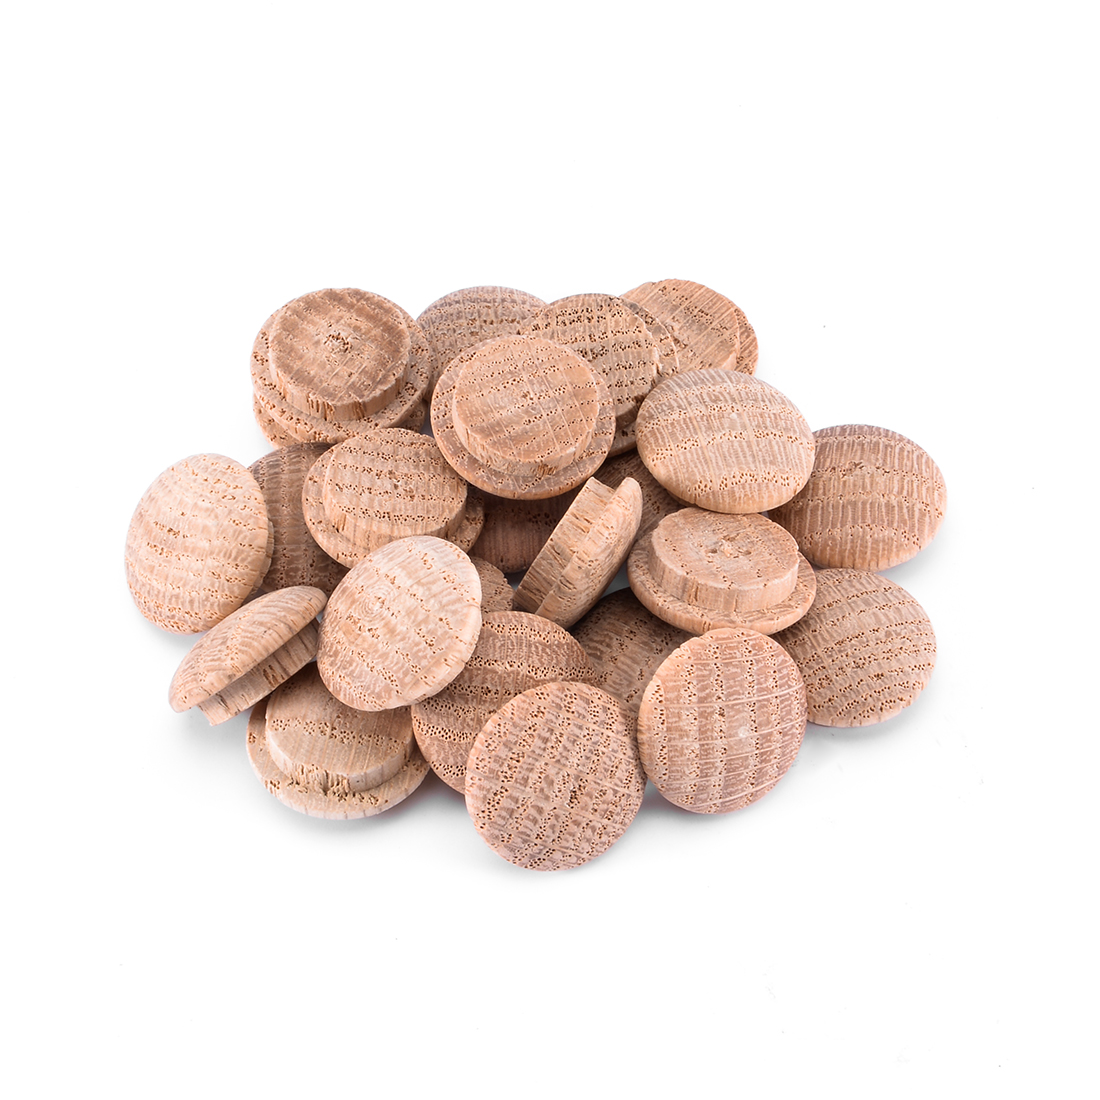 3/5-Inch Oak Button Top Wood Plugs 25 Pcs